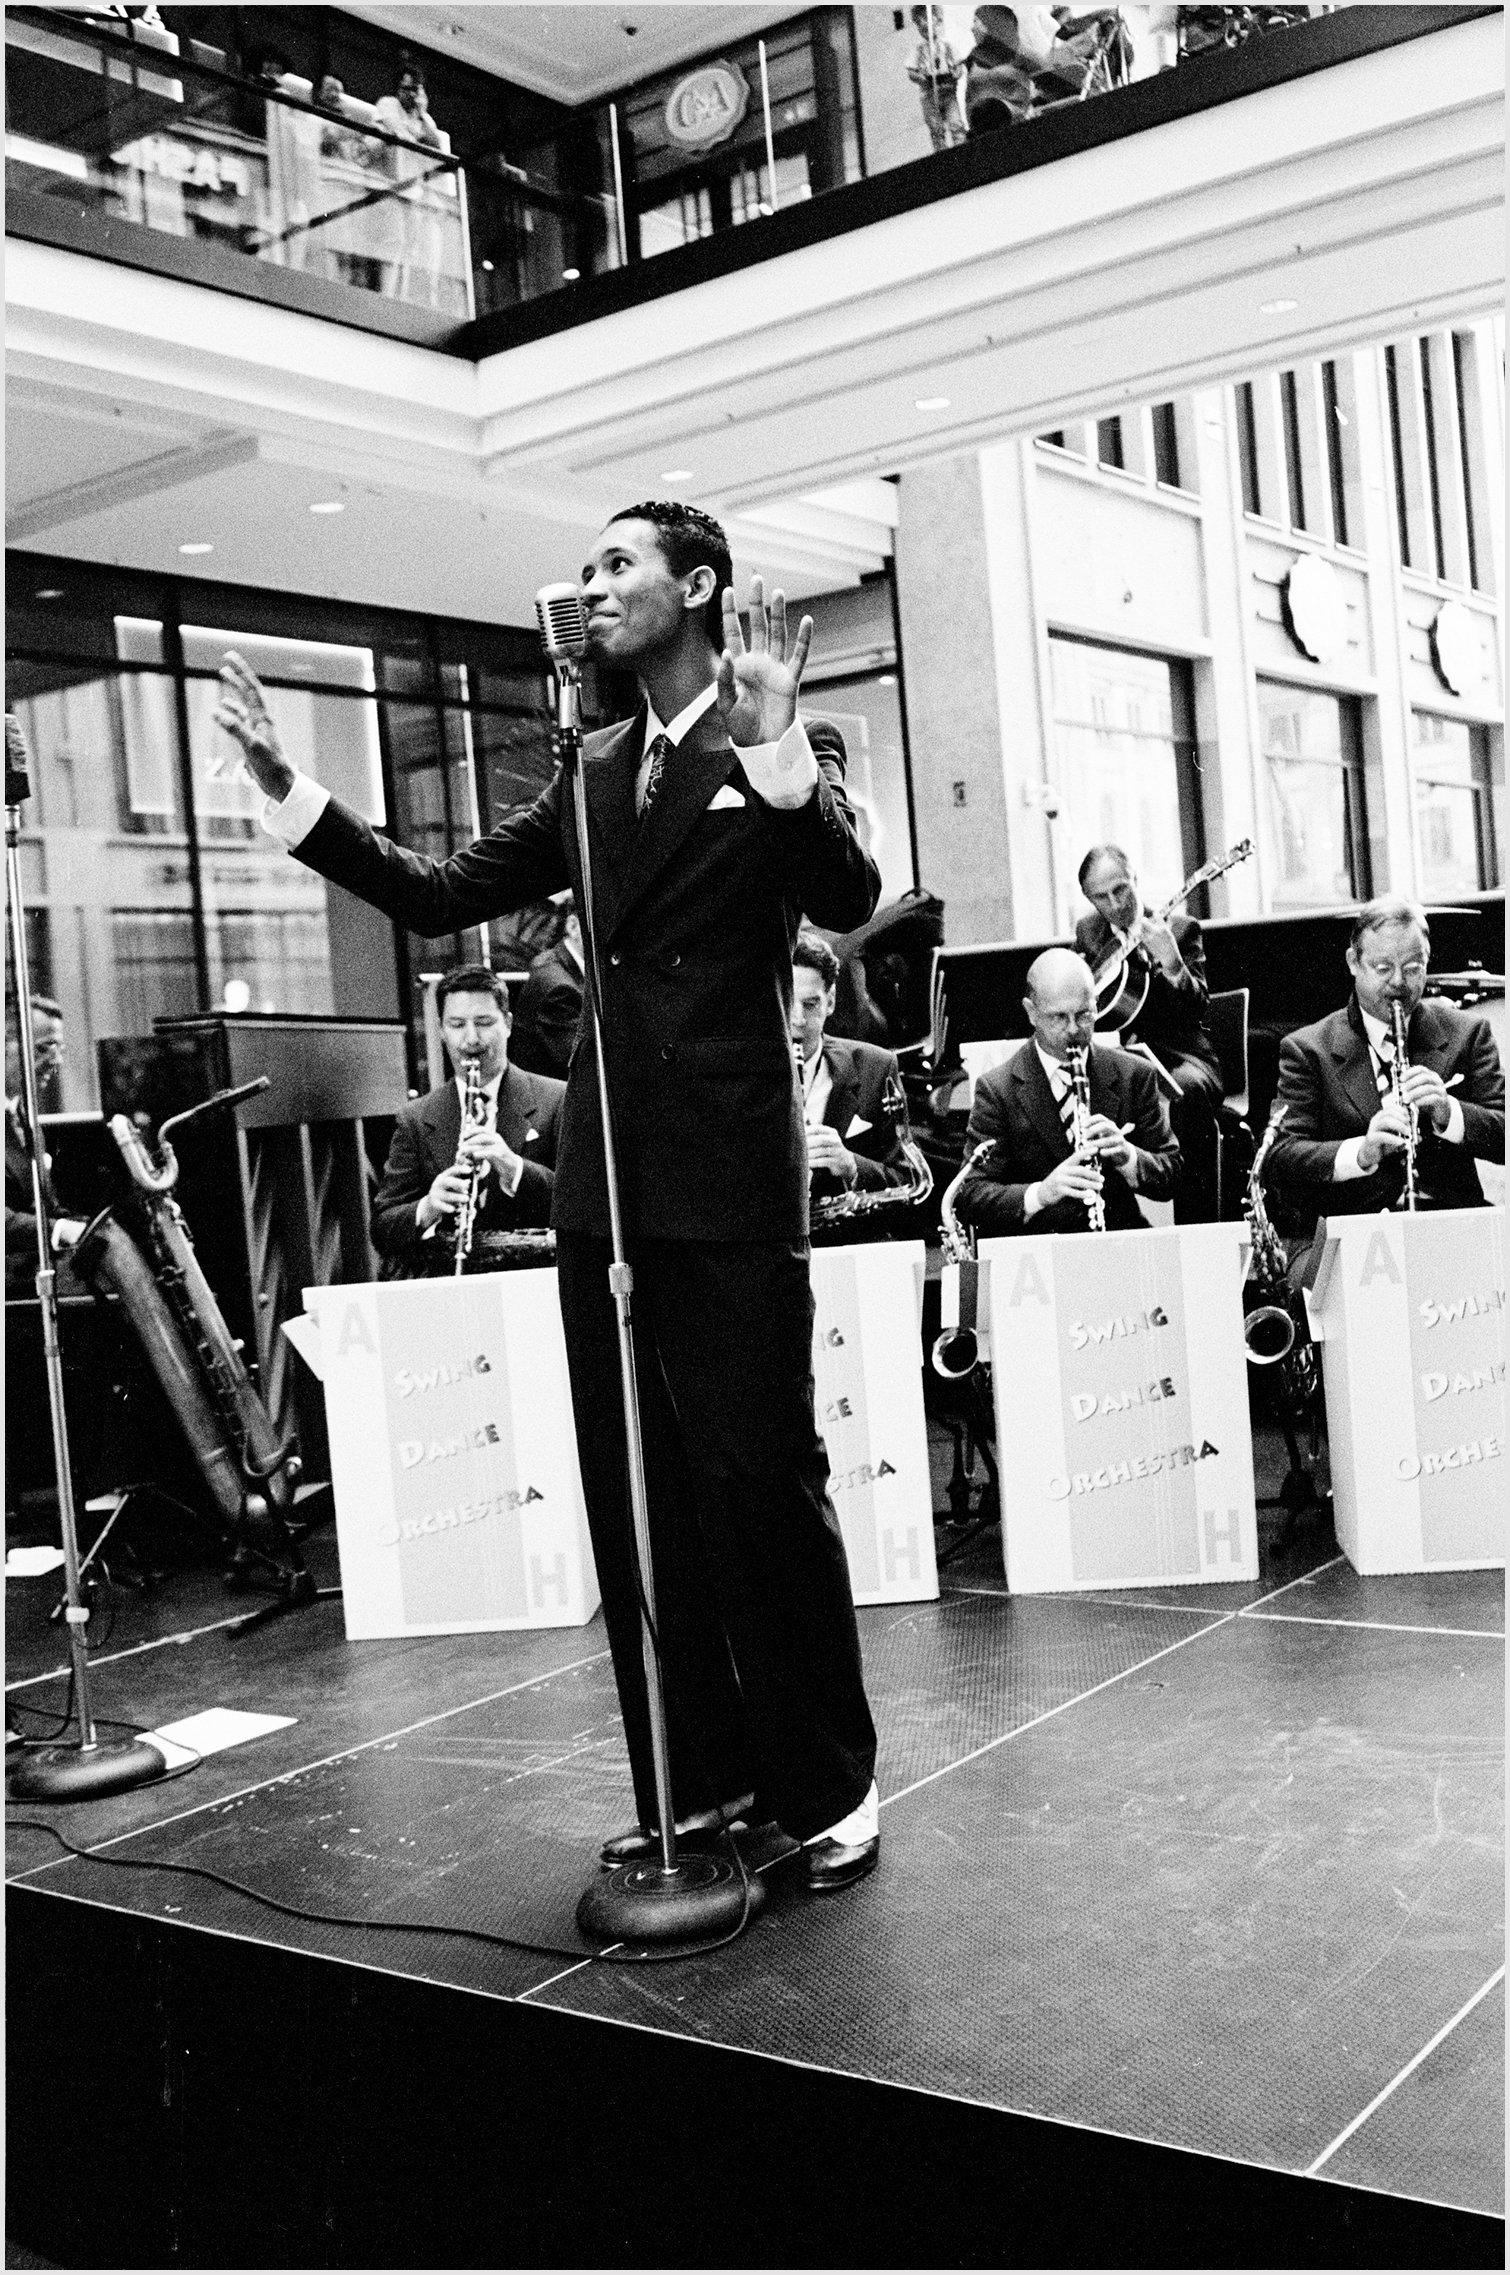 Singer in Berlin